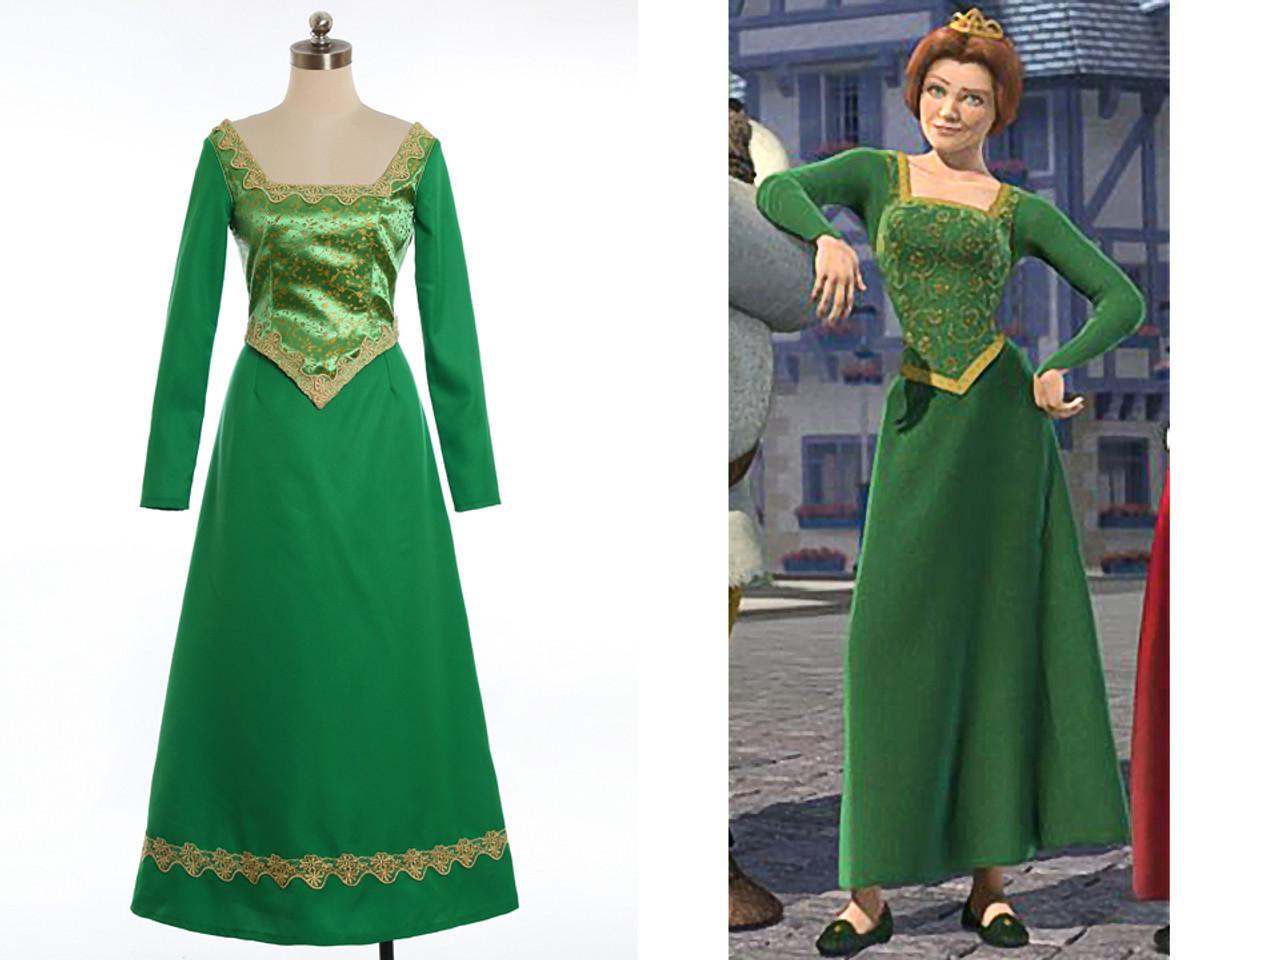 Disney Shrek Cosplay, Princess Fiona Costume Renaissance Wedding Dress